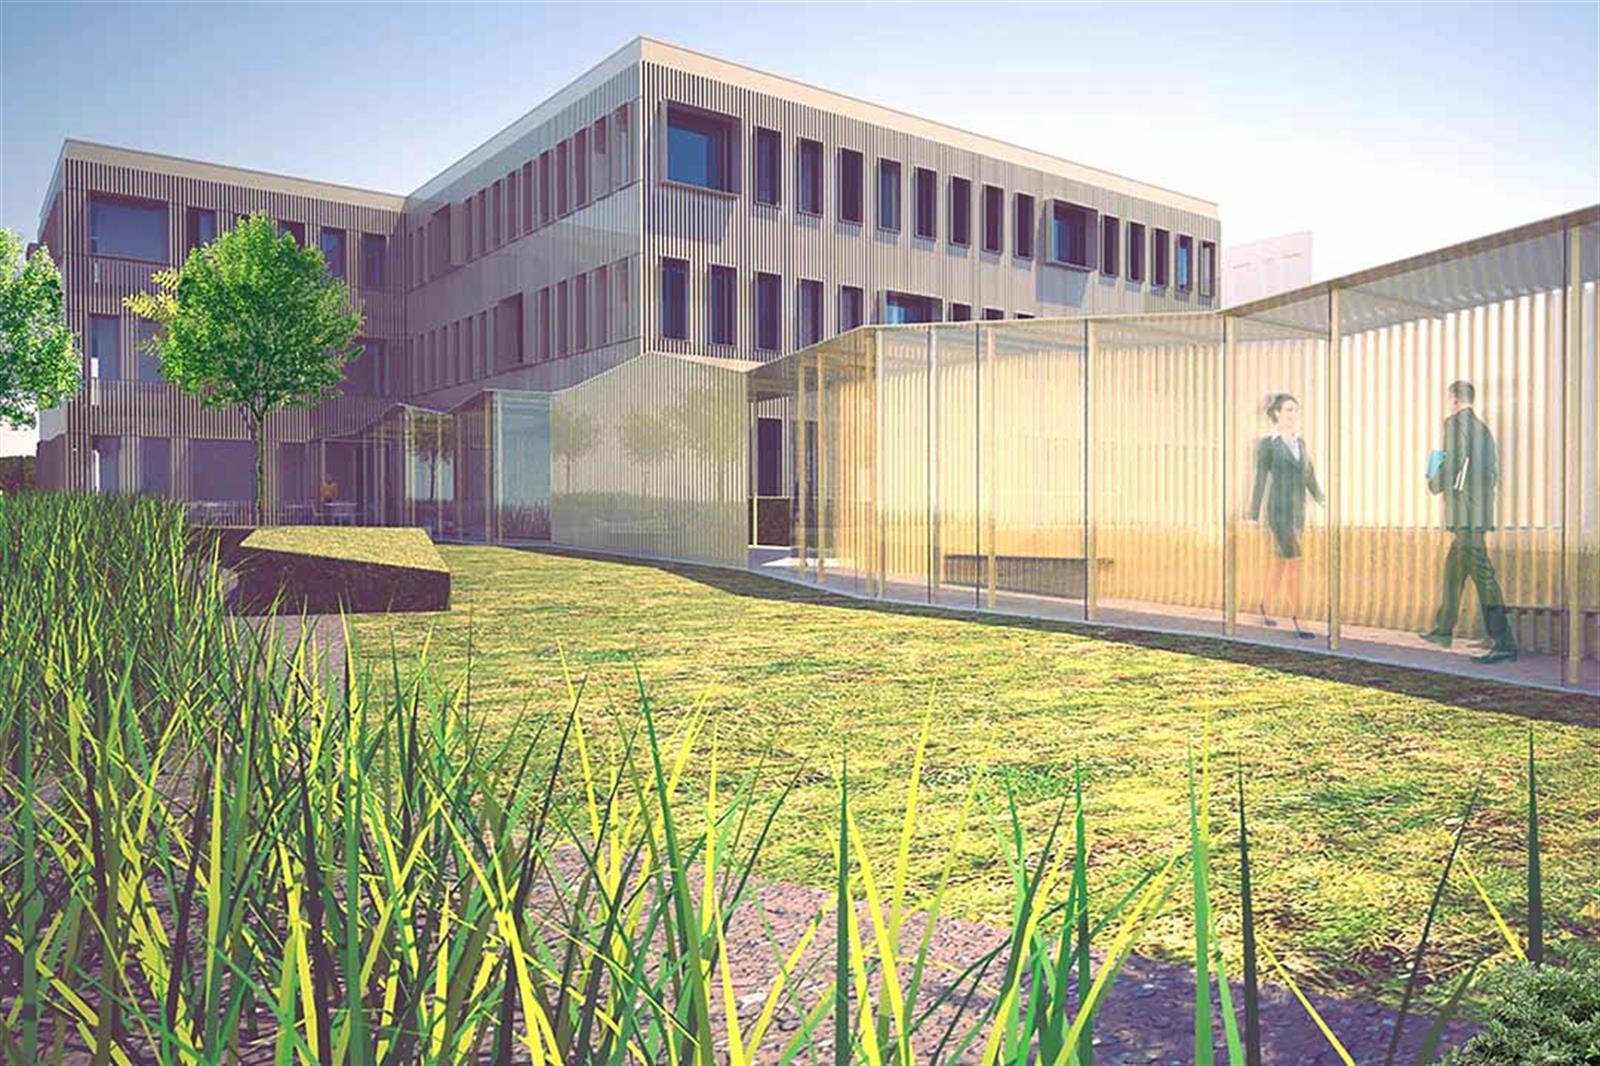 Moreno architecture associ s space management design for Reputation meubles concept